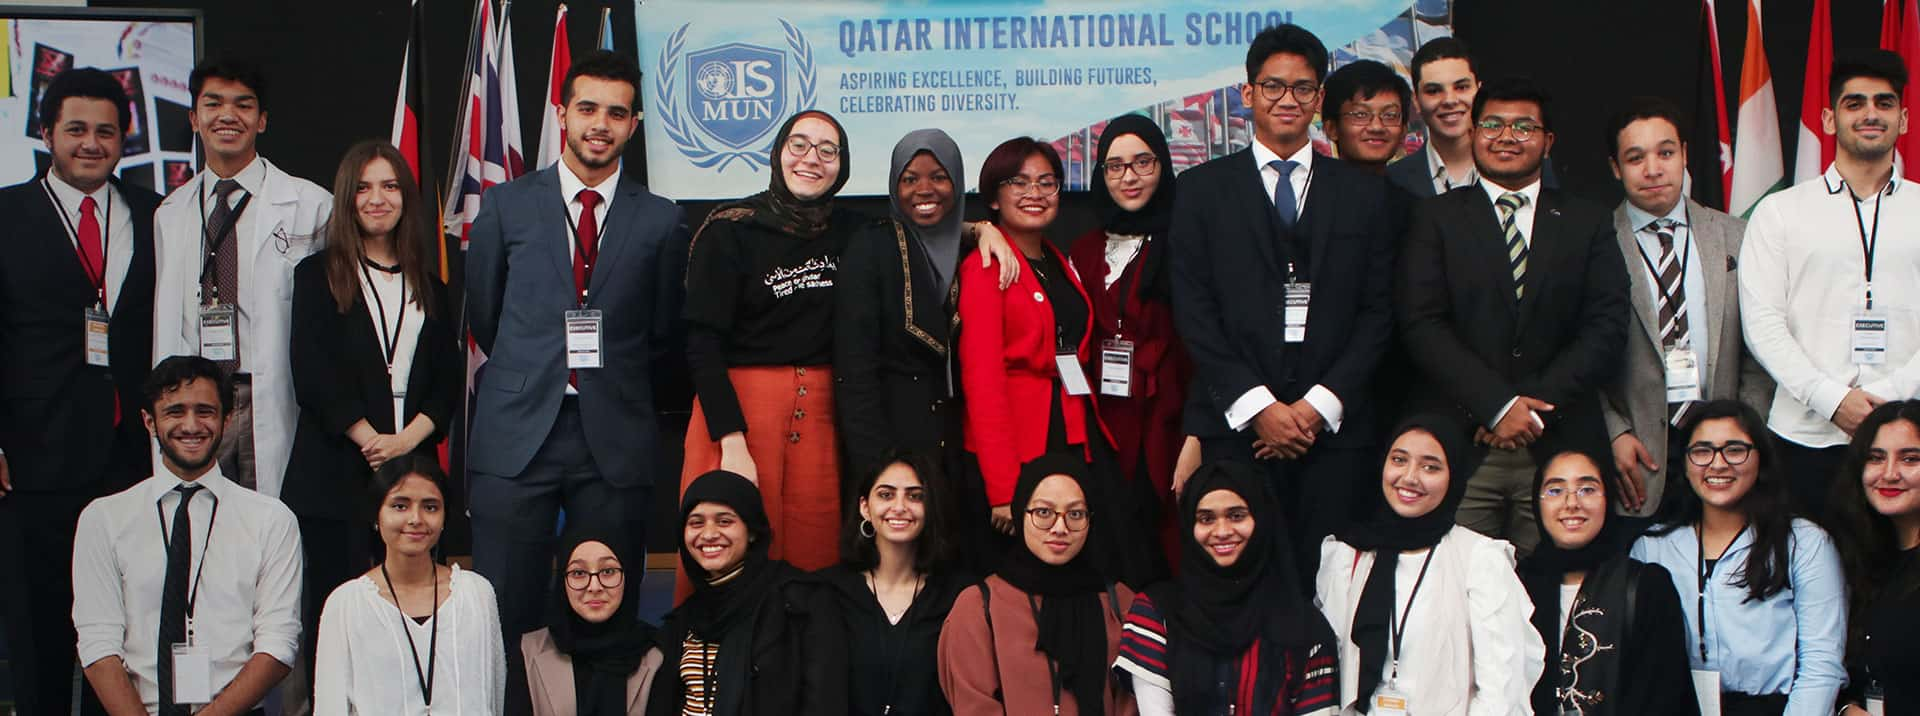 QIS Model United Nations